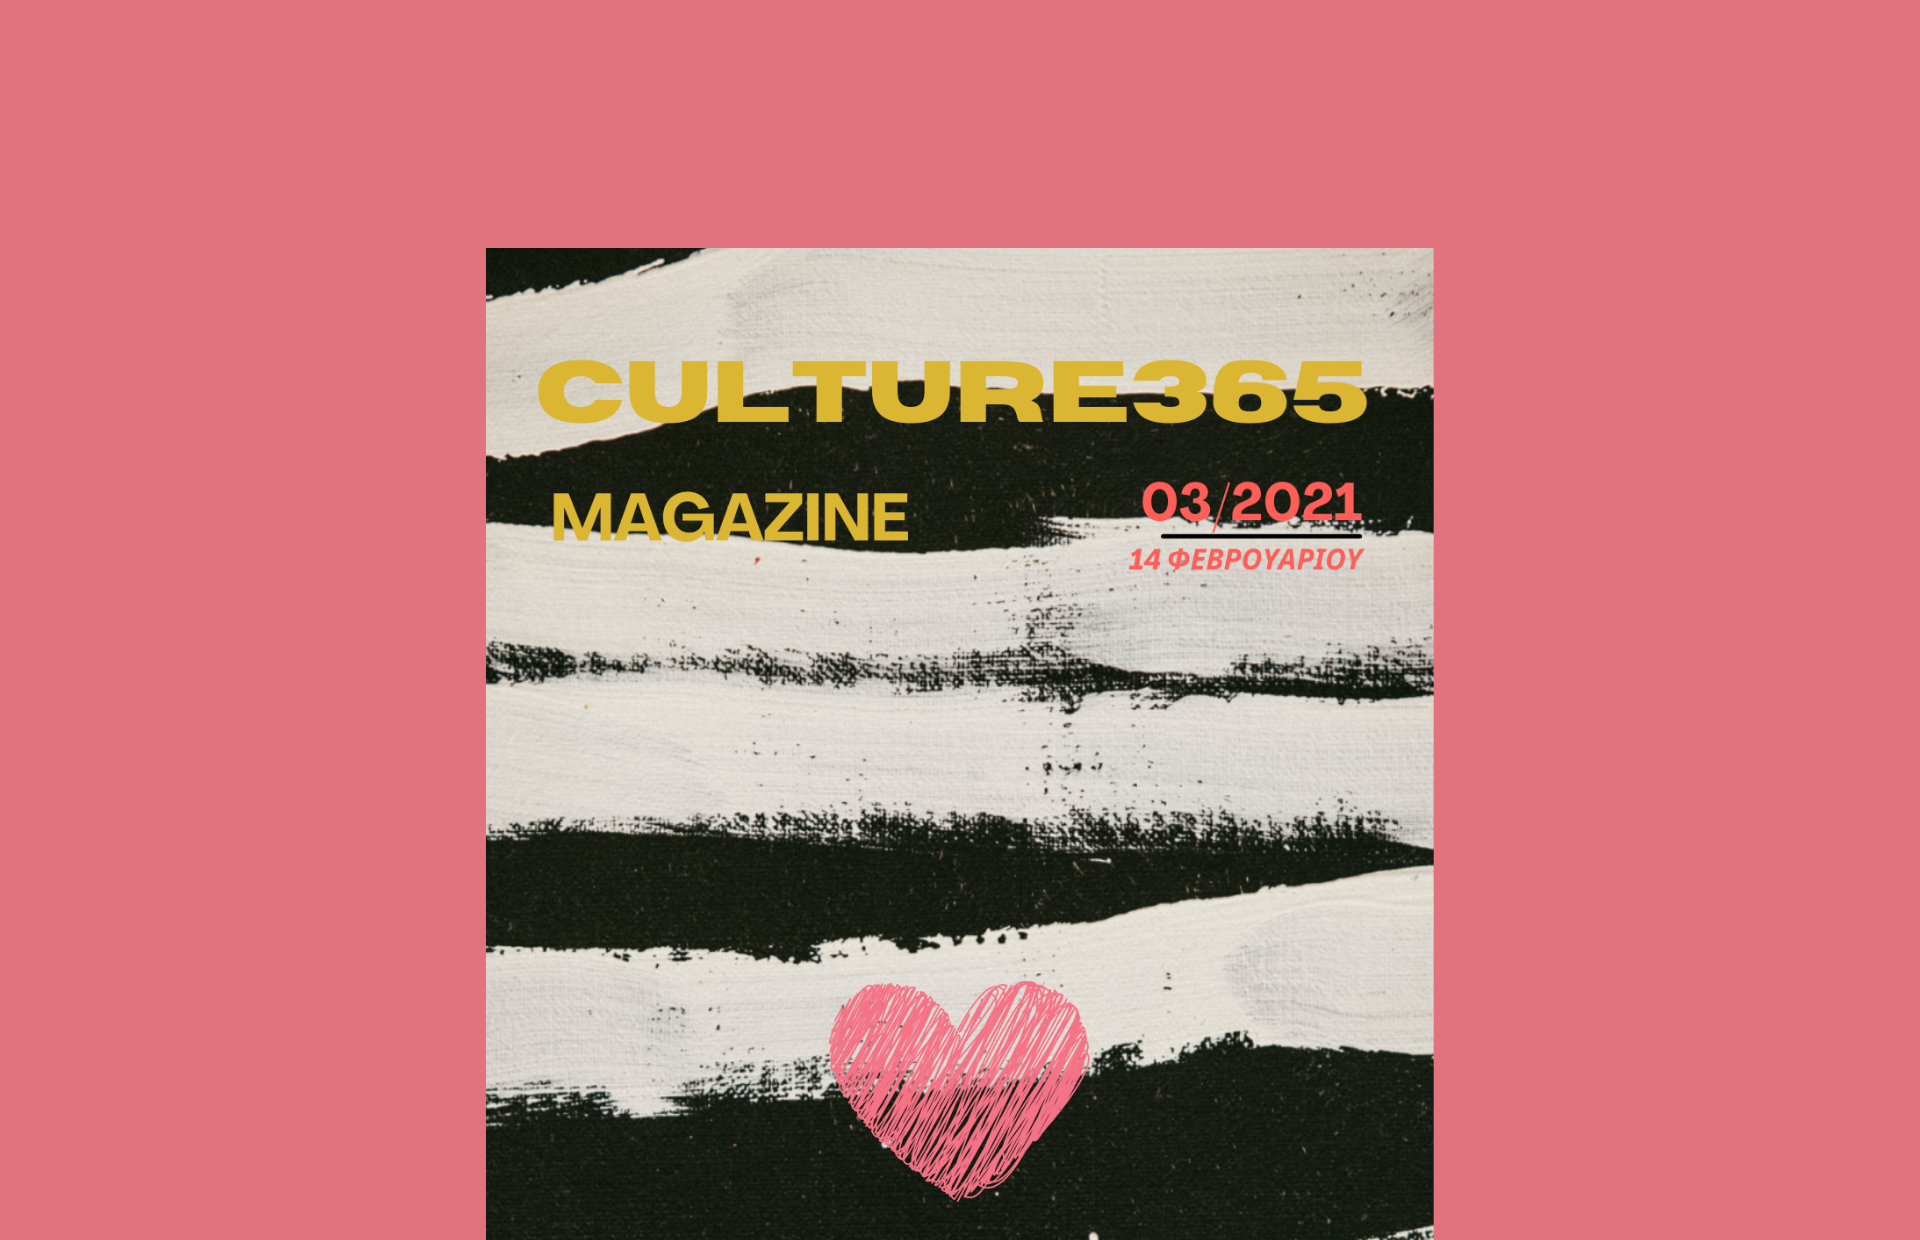 Culture365 Magazine | Issue 03/2021